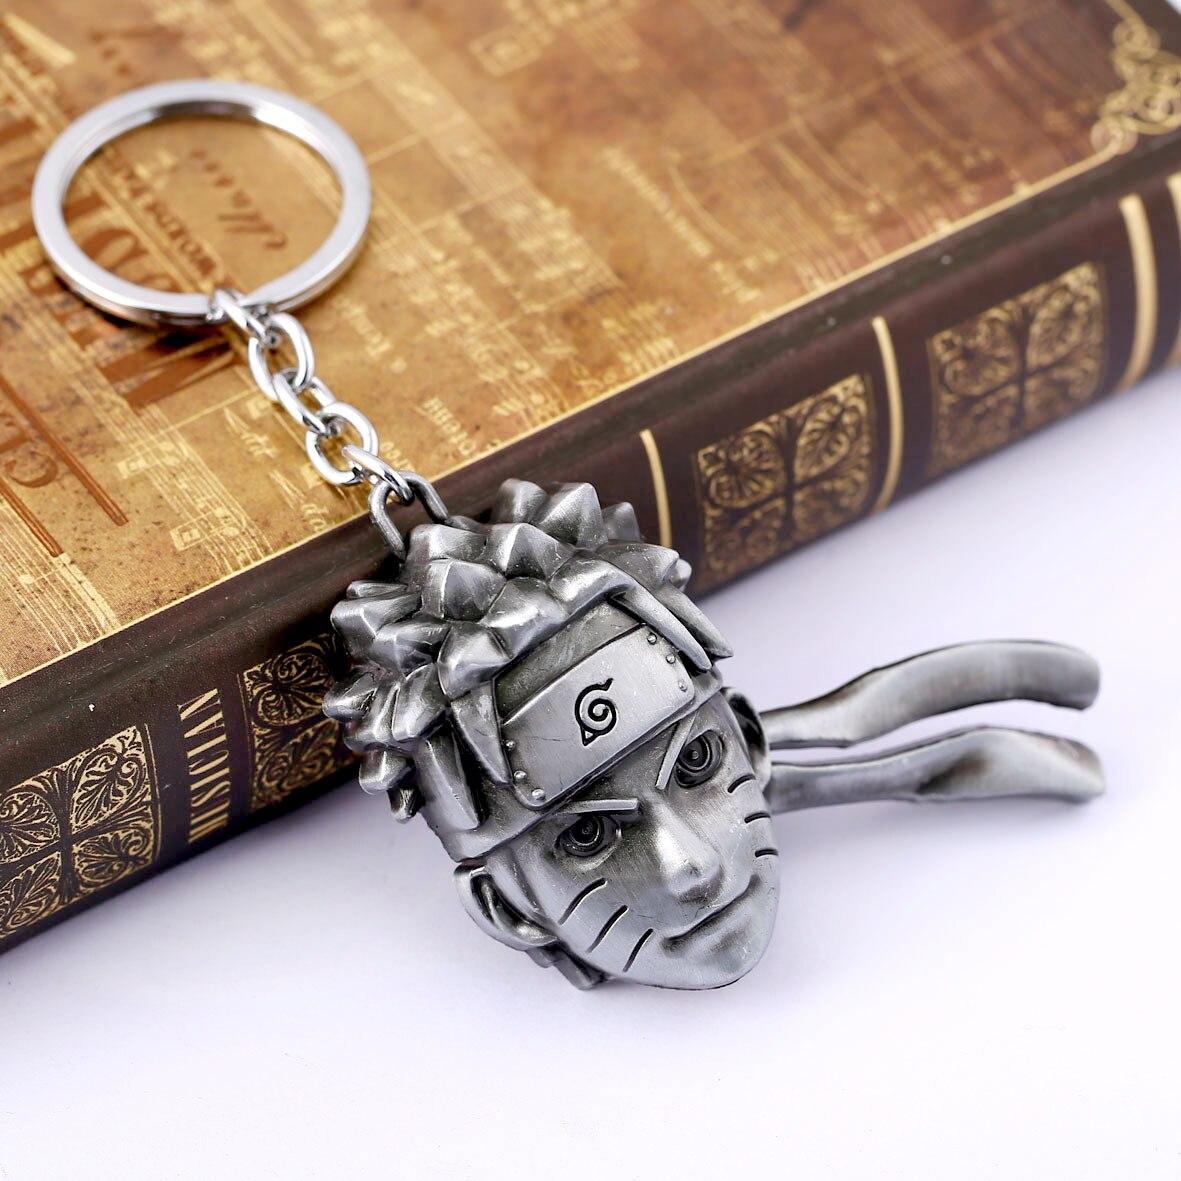 24 Pcs Lot Naruto Key Chain Hot Anime Key Rings For Gift Chaveiro Car Keychain Jewelry